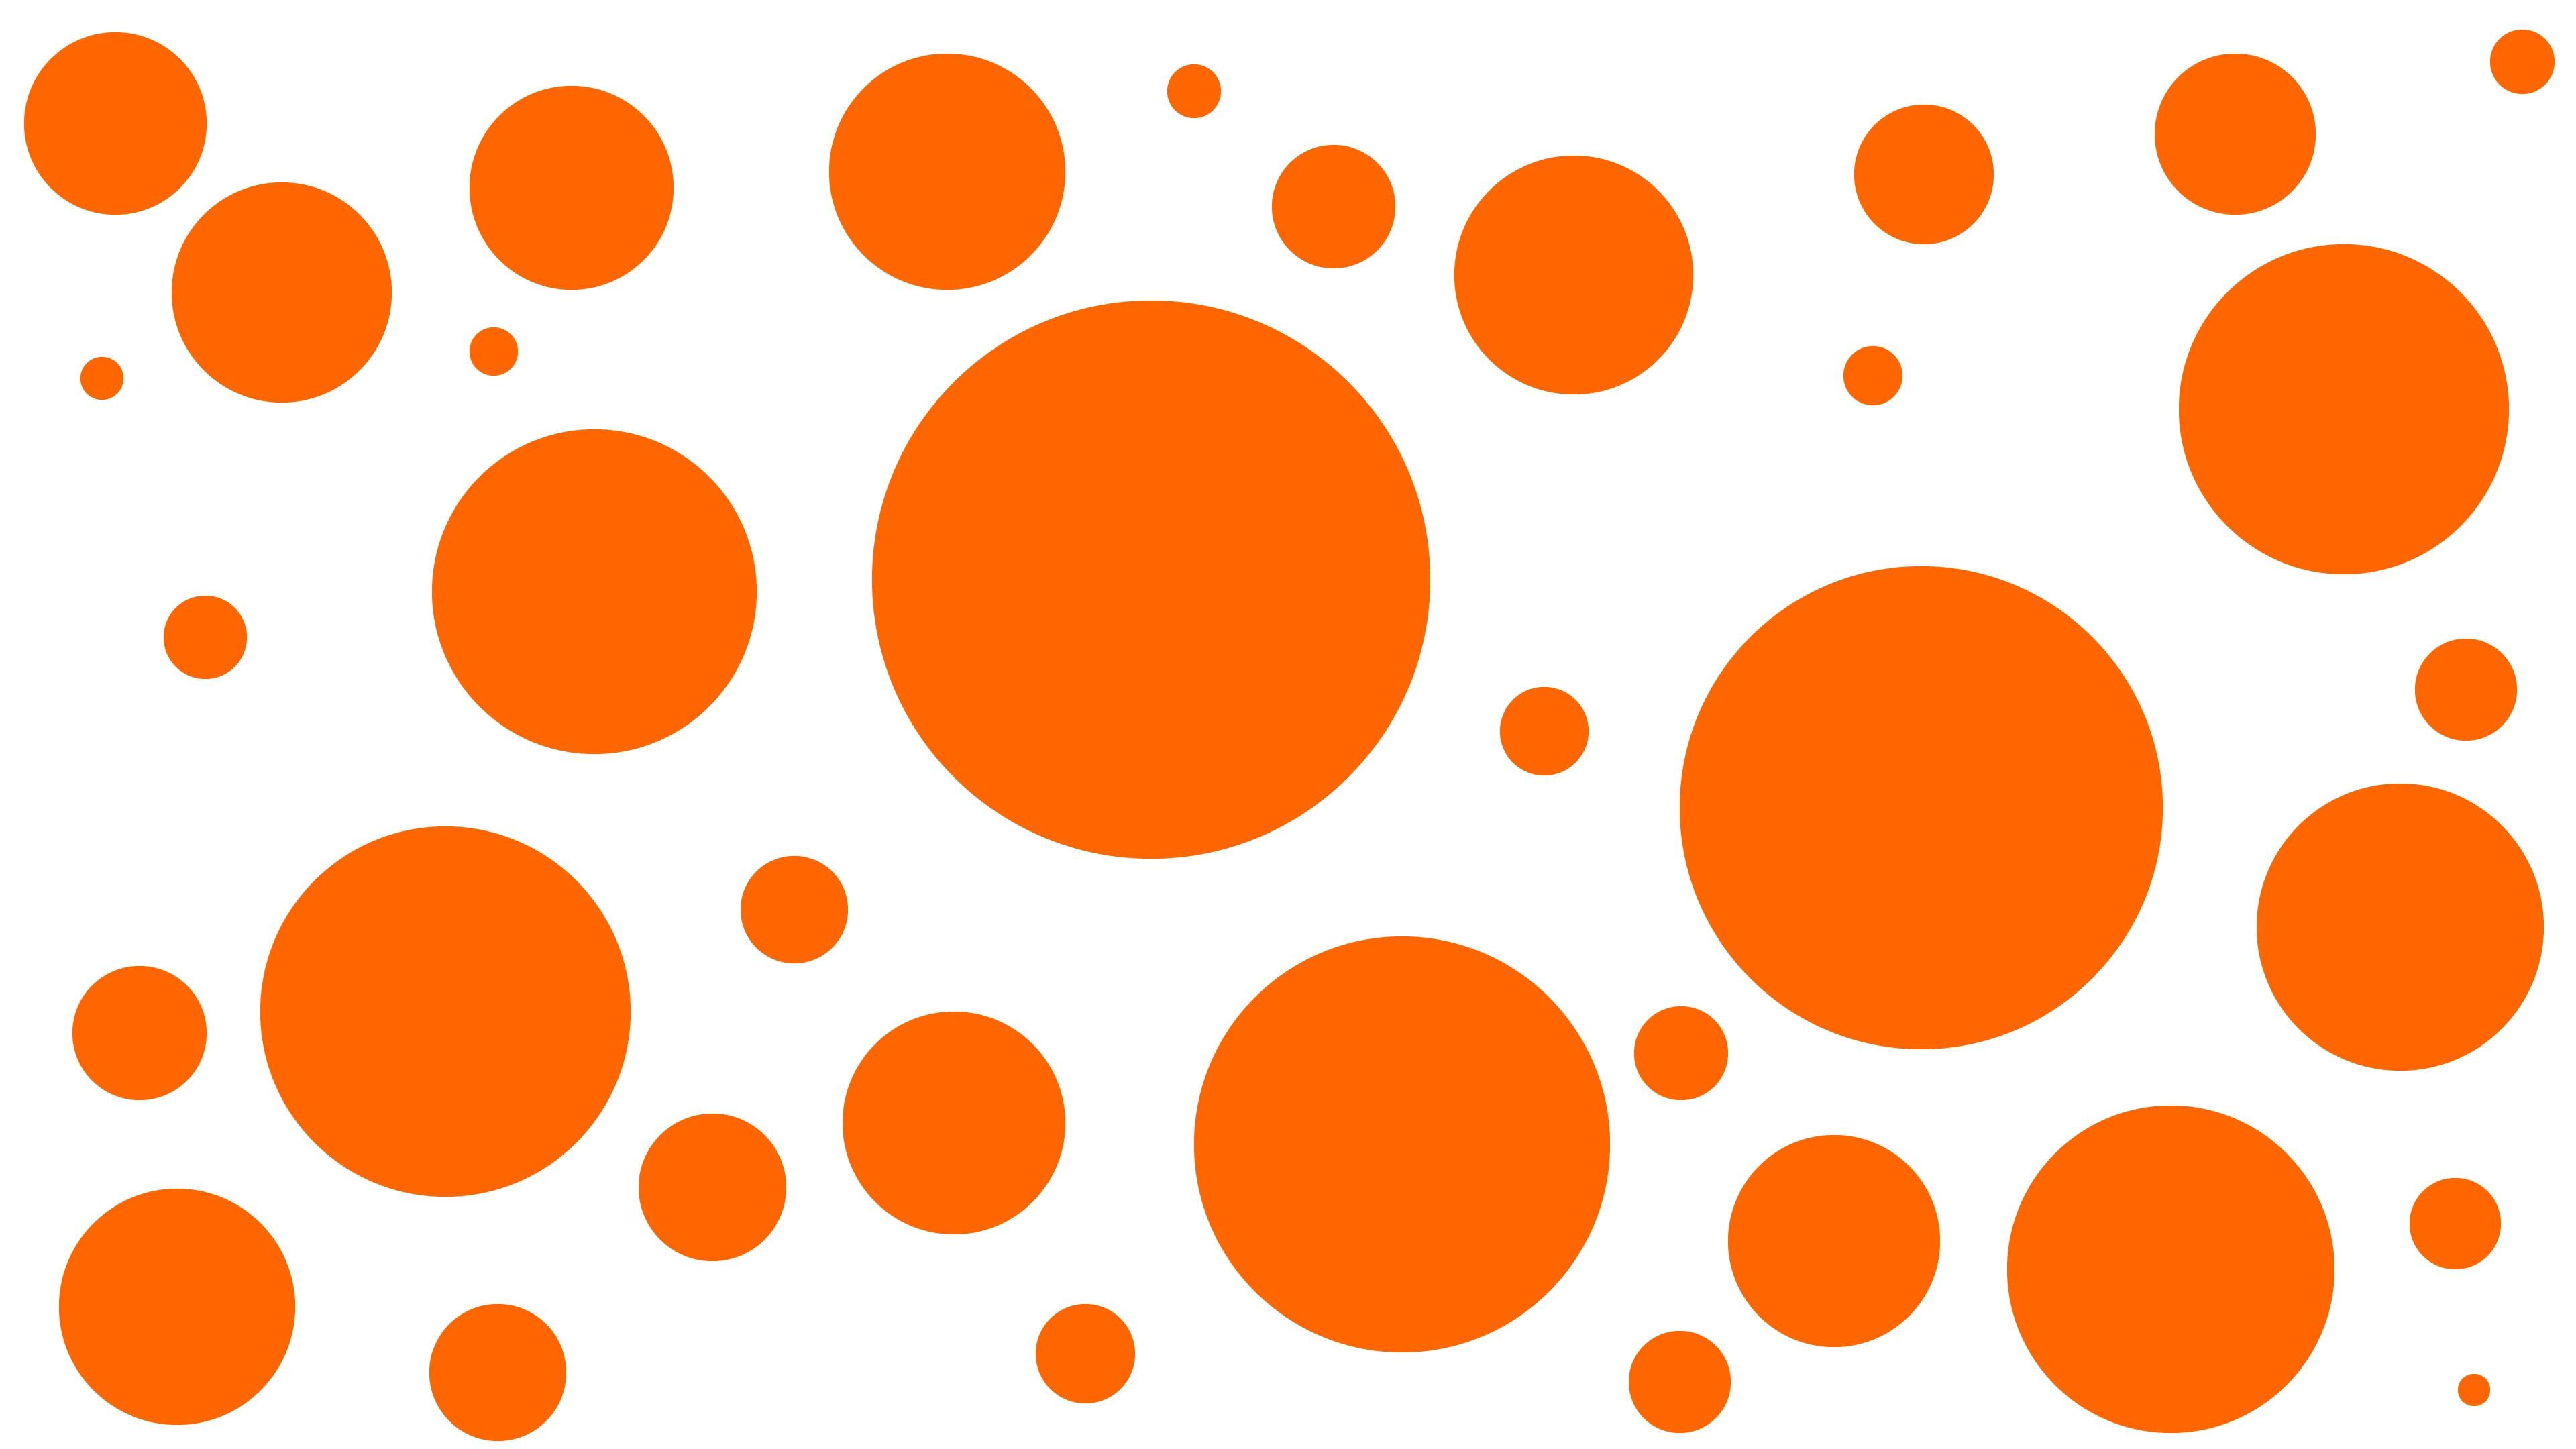 Оранжевые круг картинки